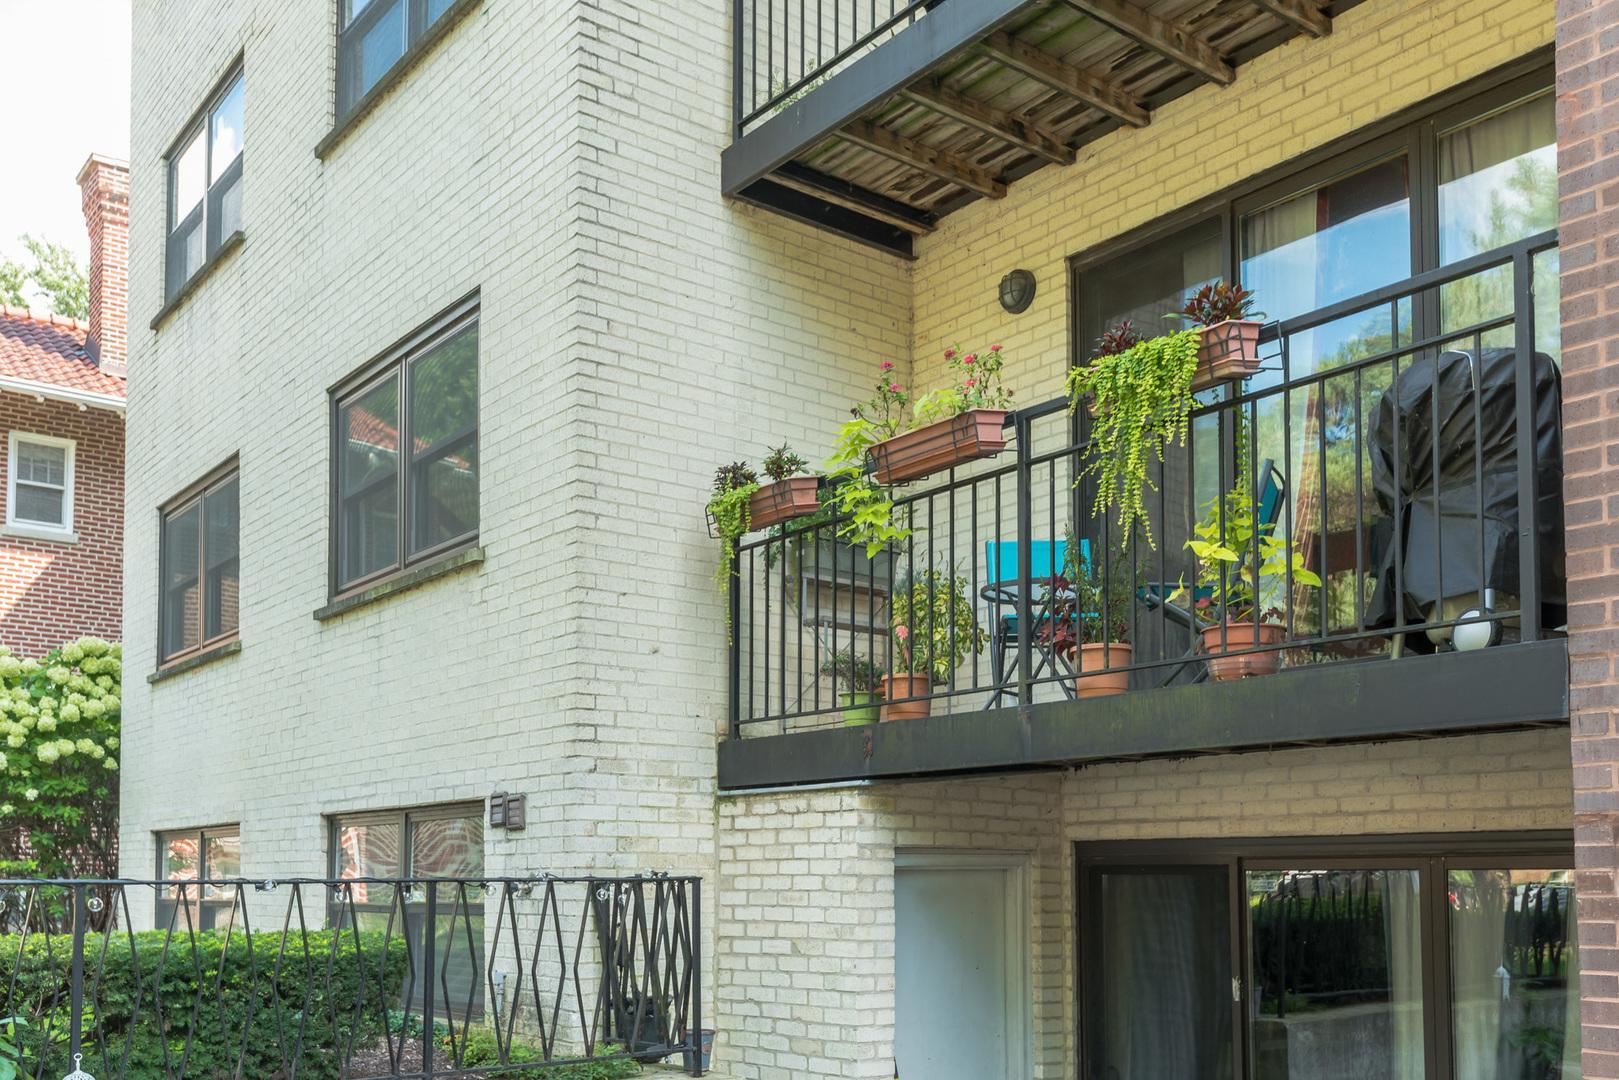 1629 W Sherwin  Avenue, Unit 102 photo